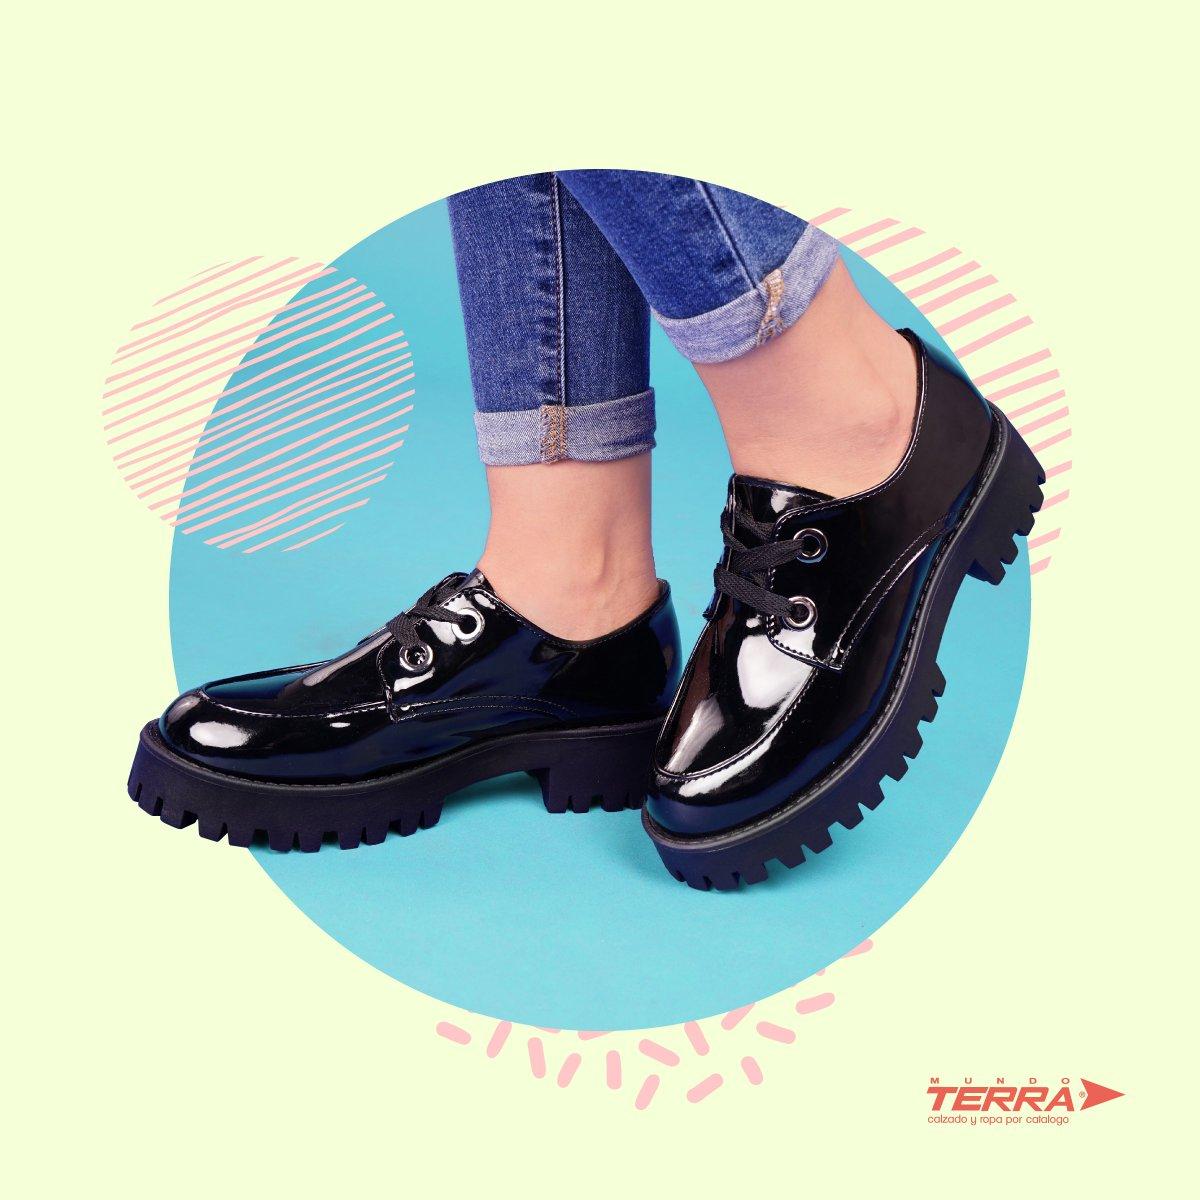 Un par que podrás utilizar en tu día a día. 💕  #mundoterra #shoes #8m #elmundoesdenosotras https://t.co/LjntyXgMmN